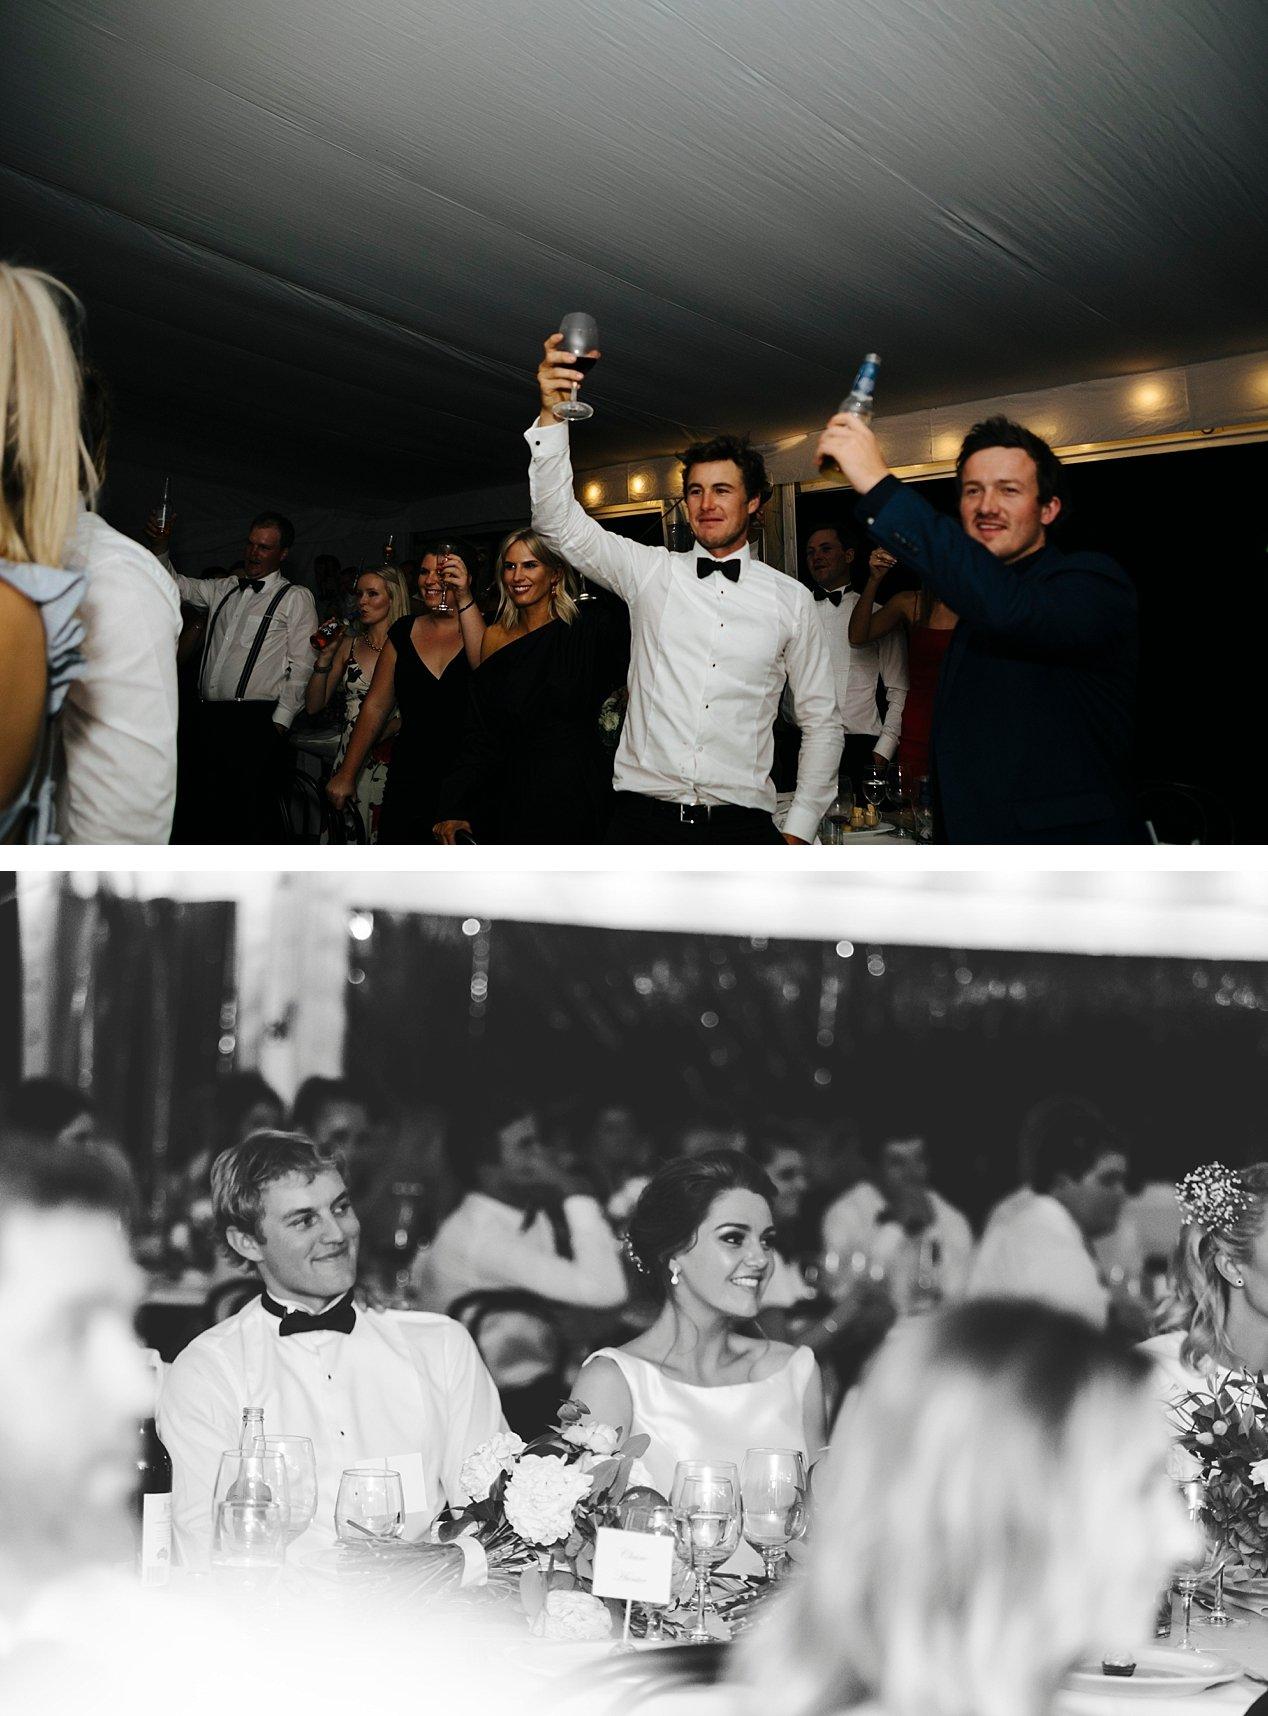 Jerilderie Wedding by Wagga Wagga Wedding Photographer Peppermint Studios_Deniliquin weddings_0107